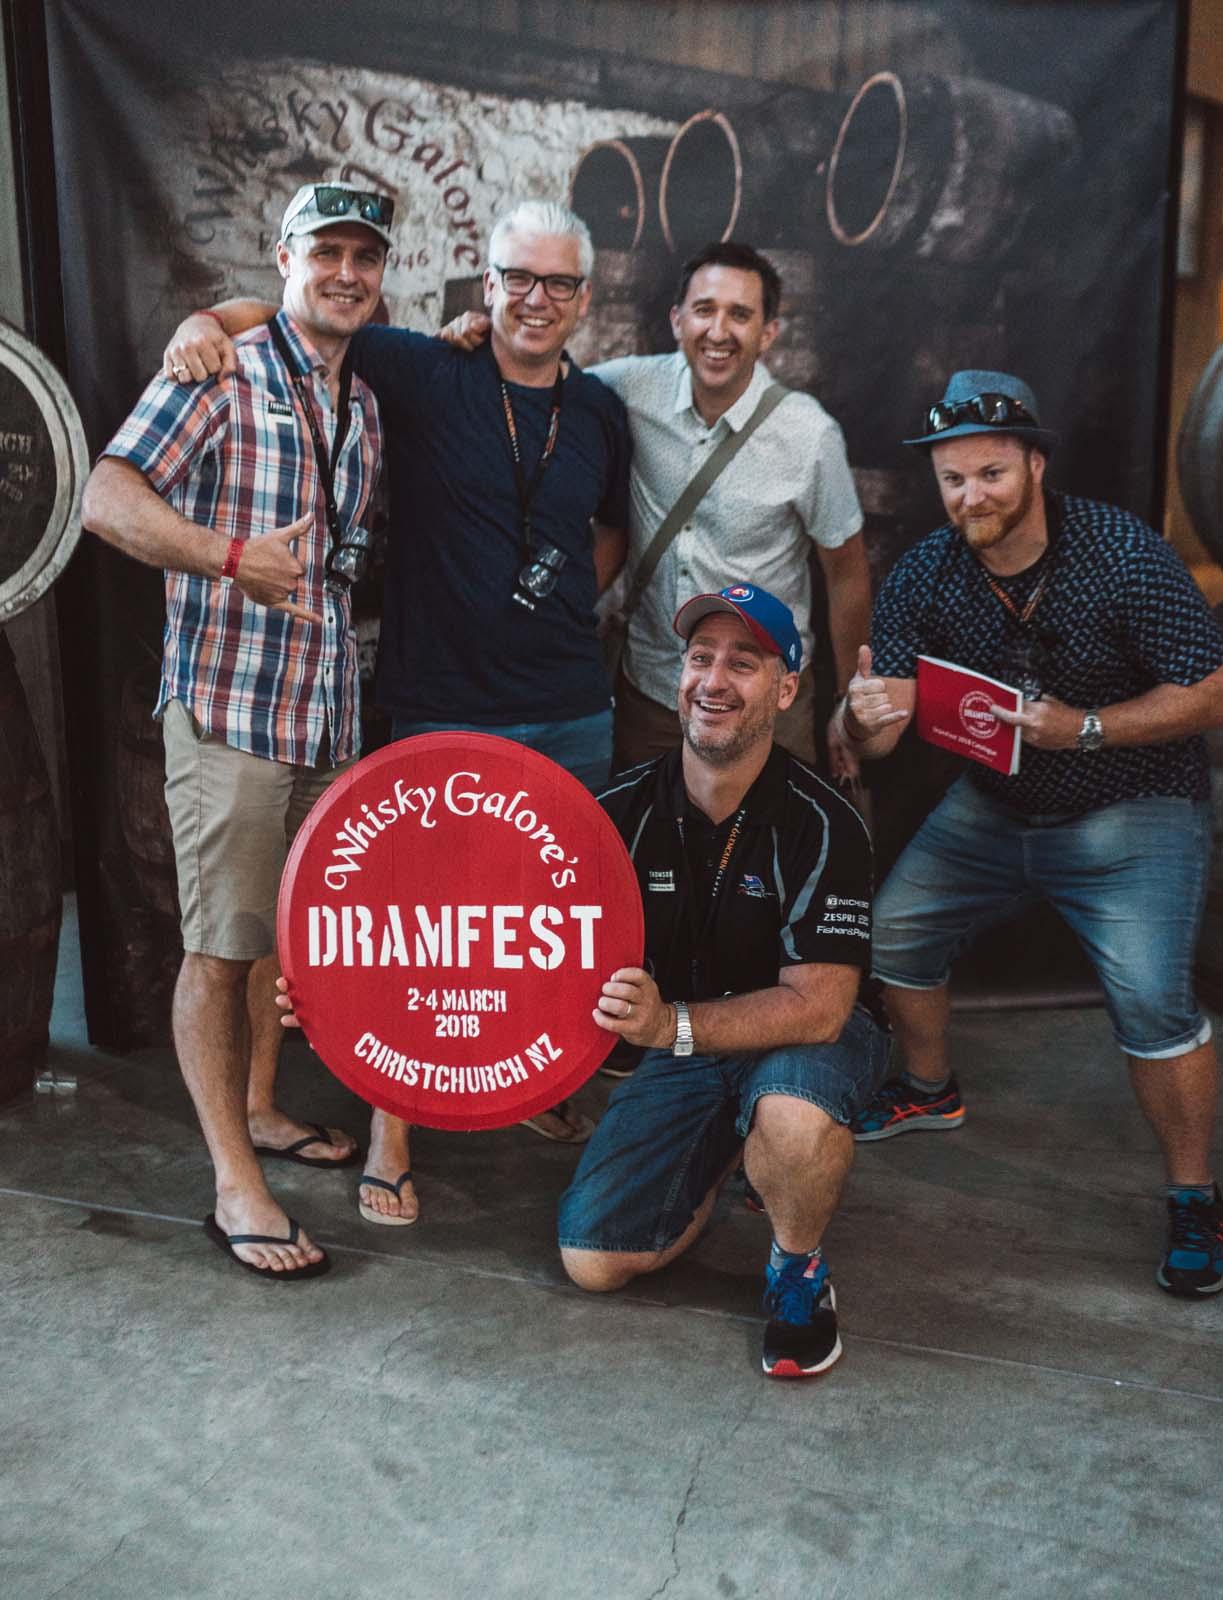 Dramfest 2018 for Whisky Galore-172.jpg